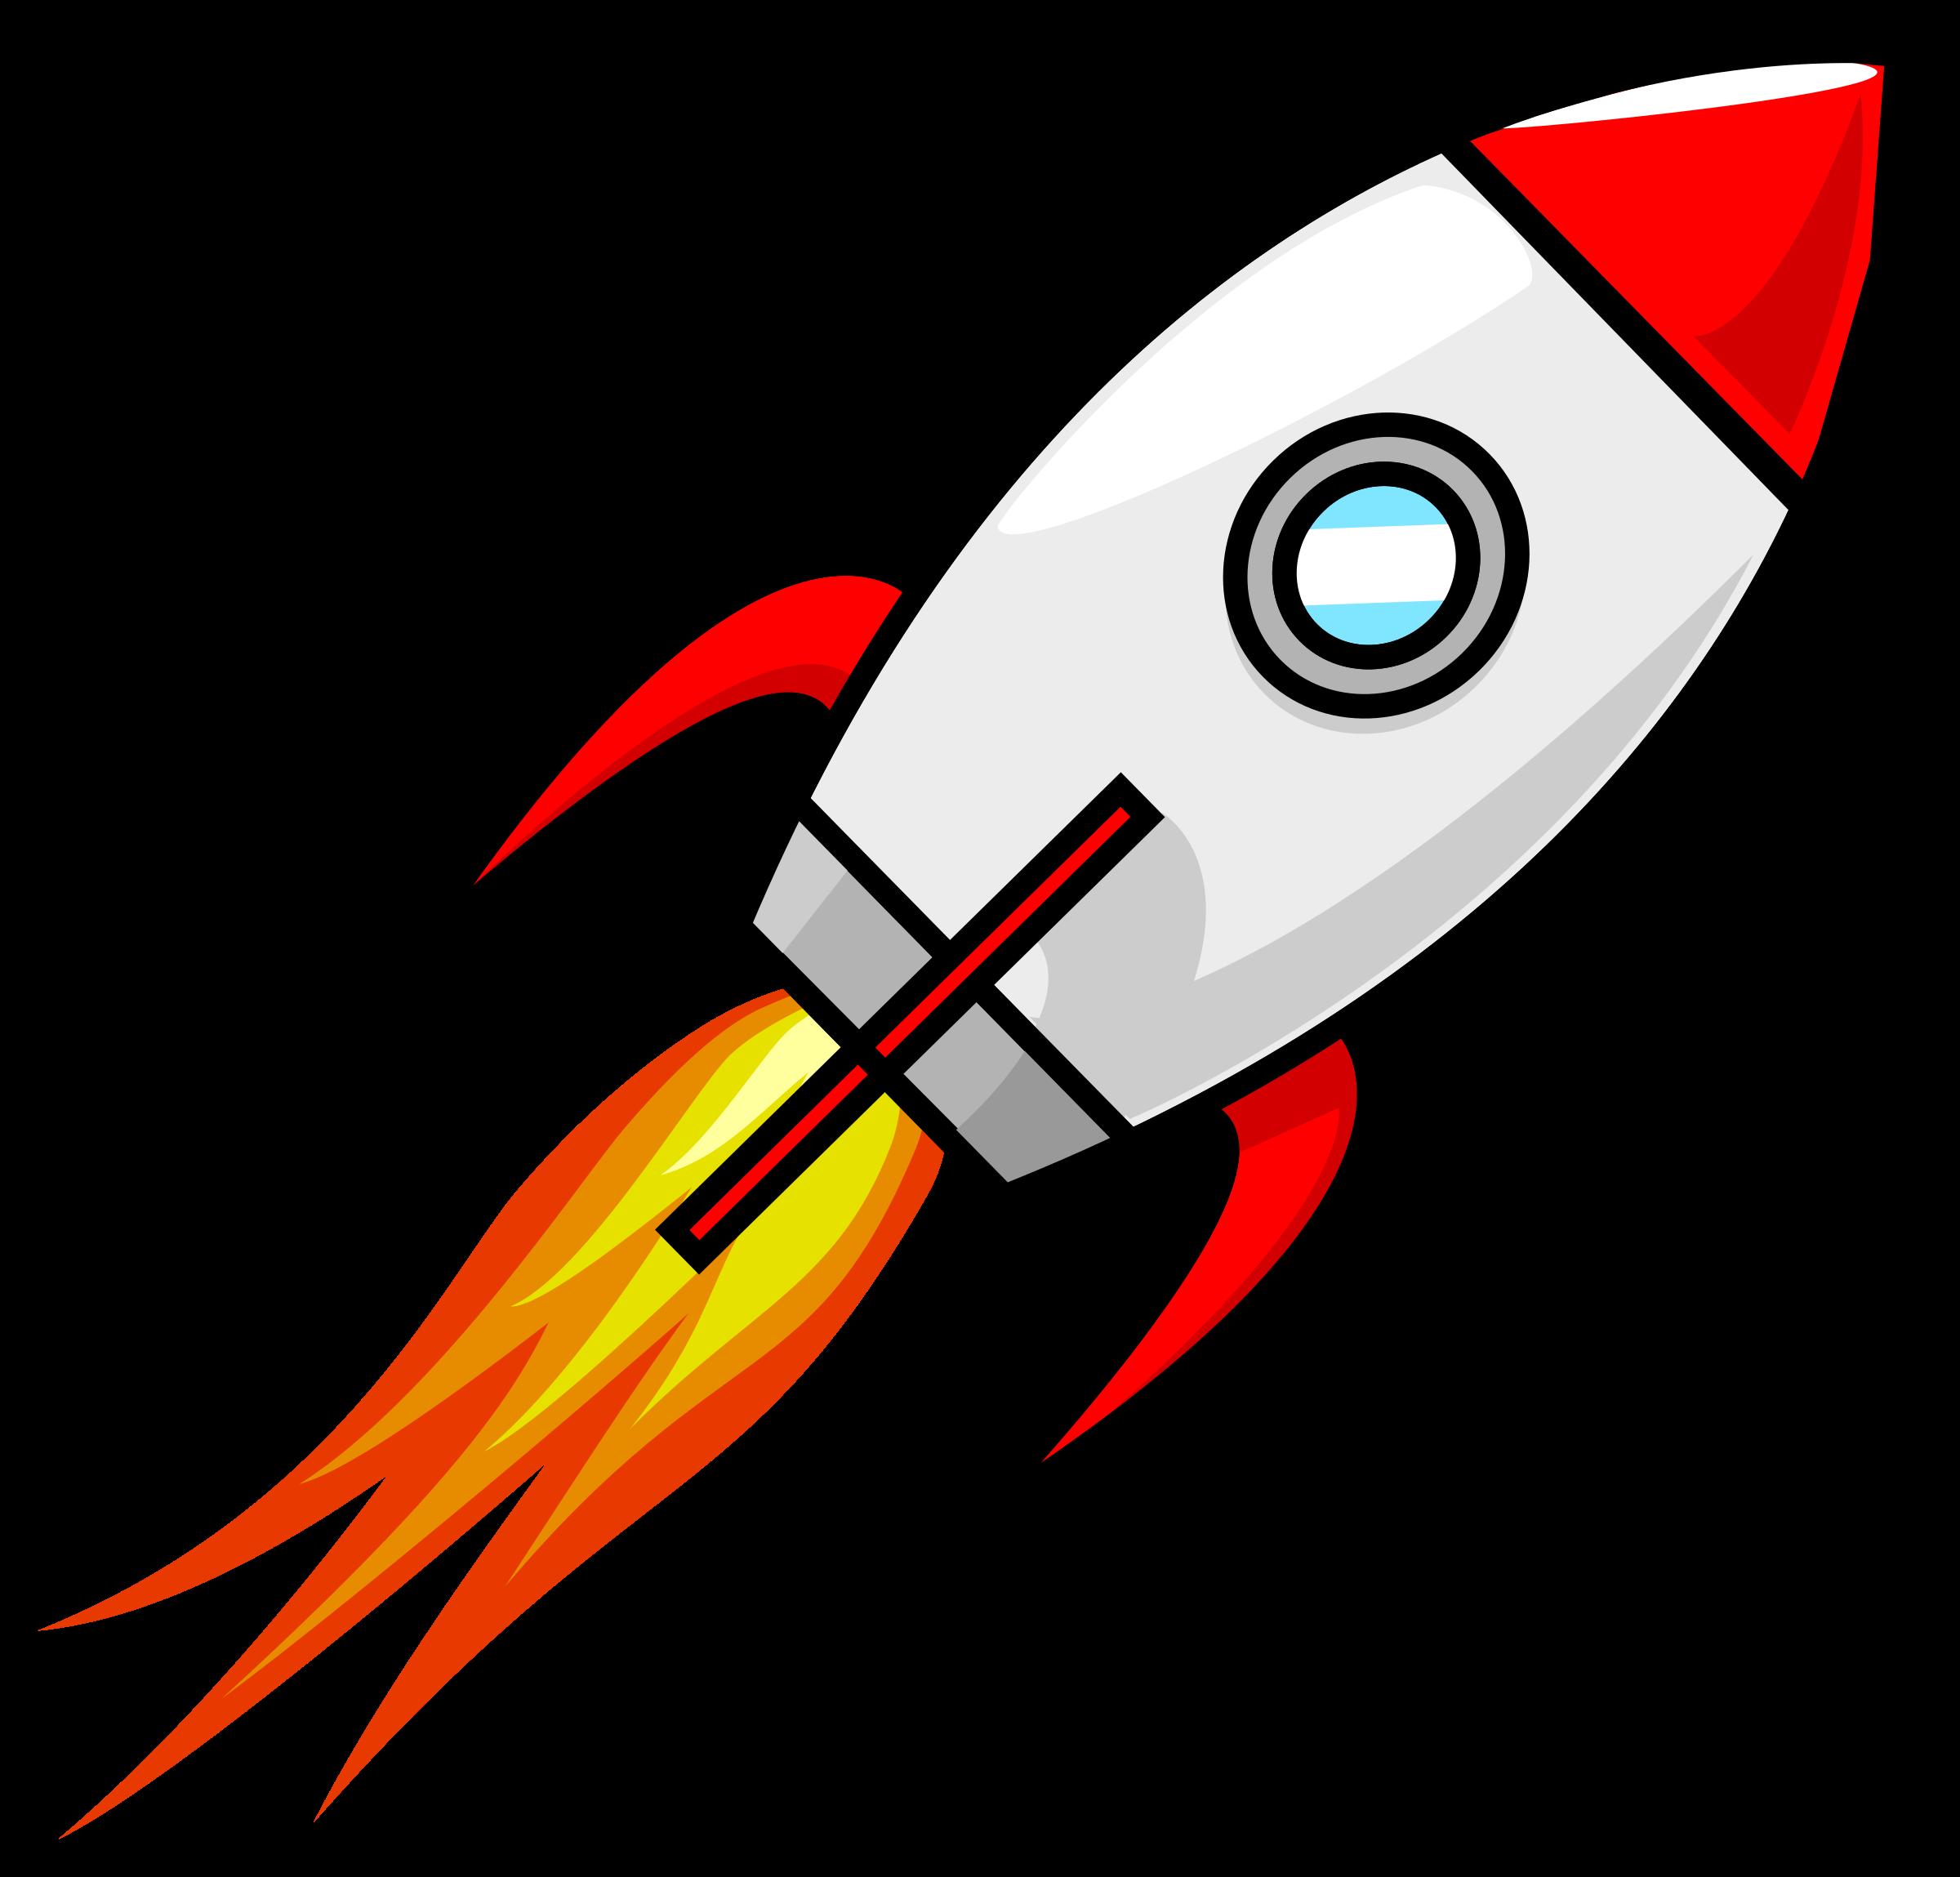 Clipart rocket plume. Foguete desenho pesquisa google